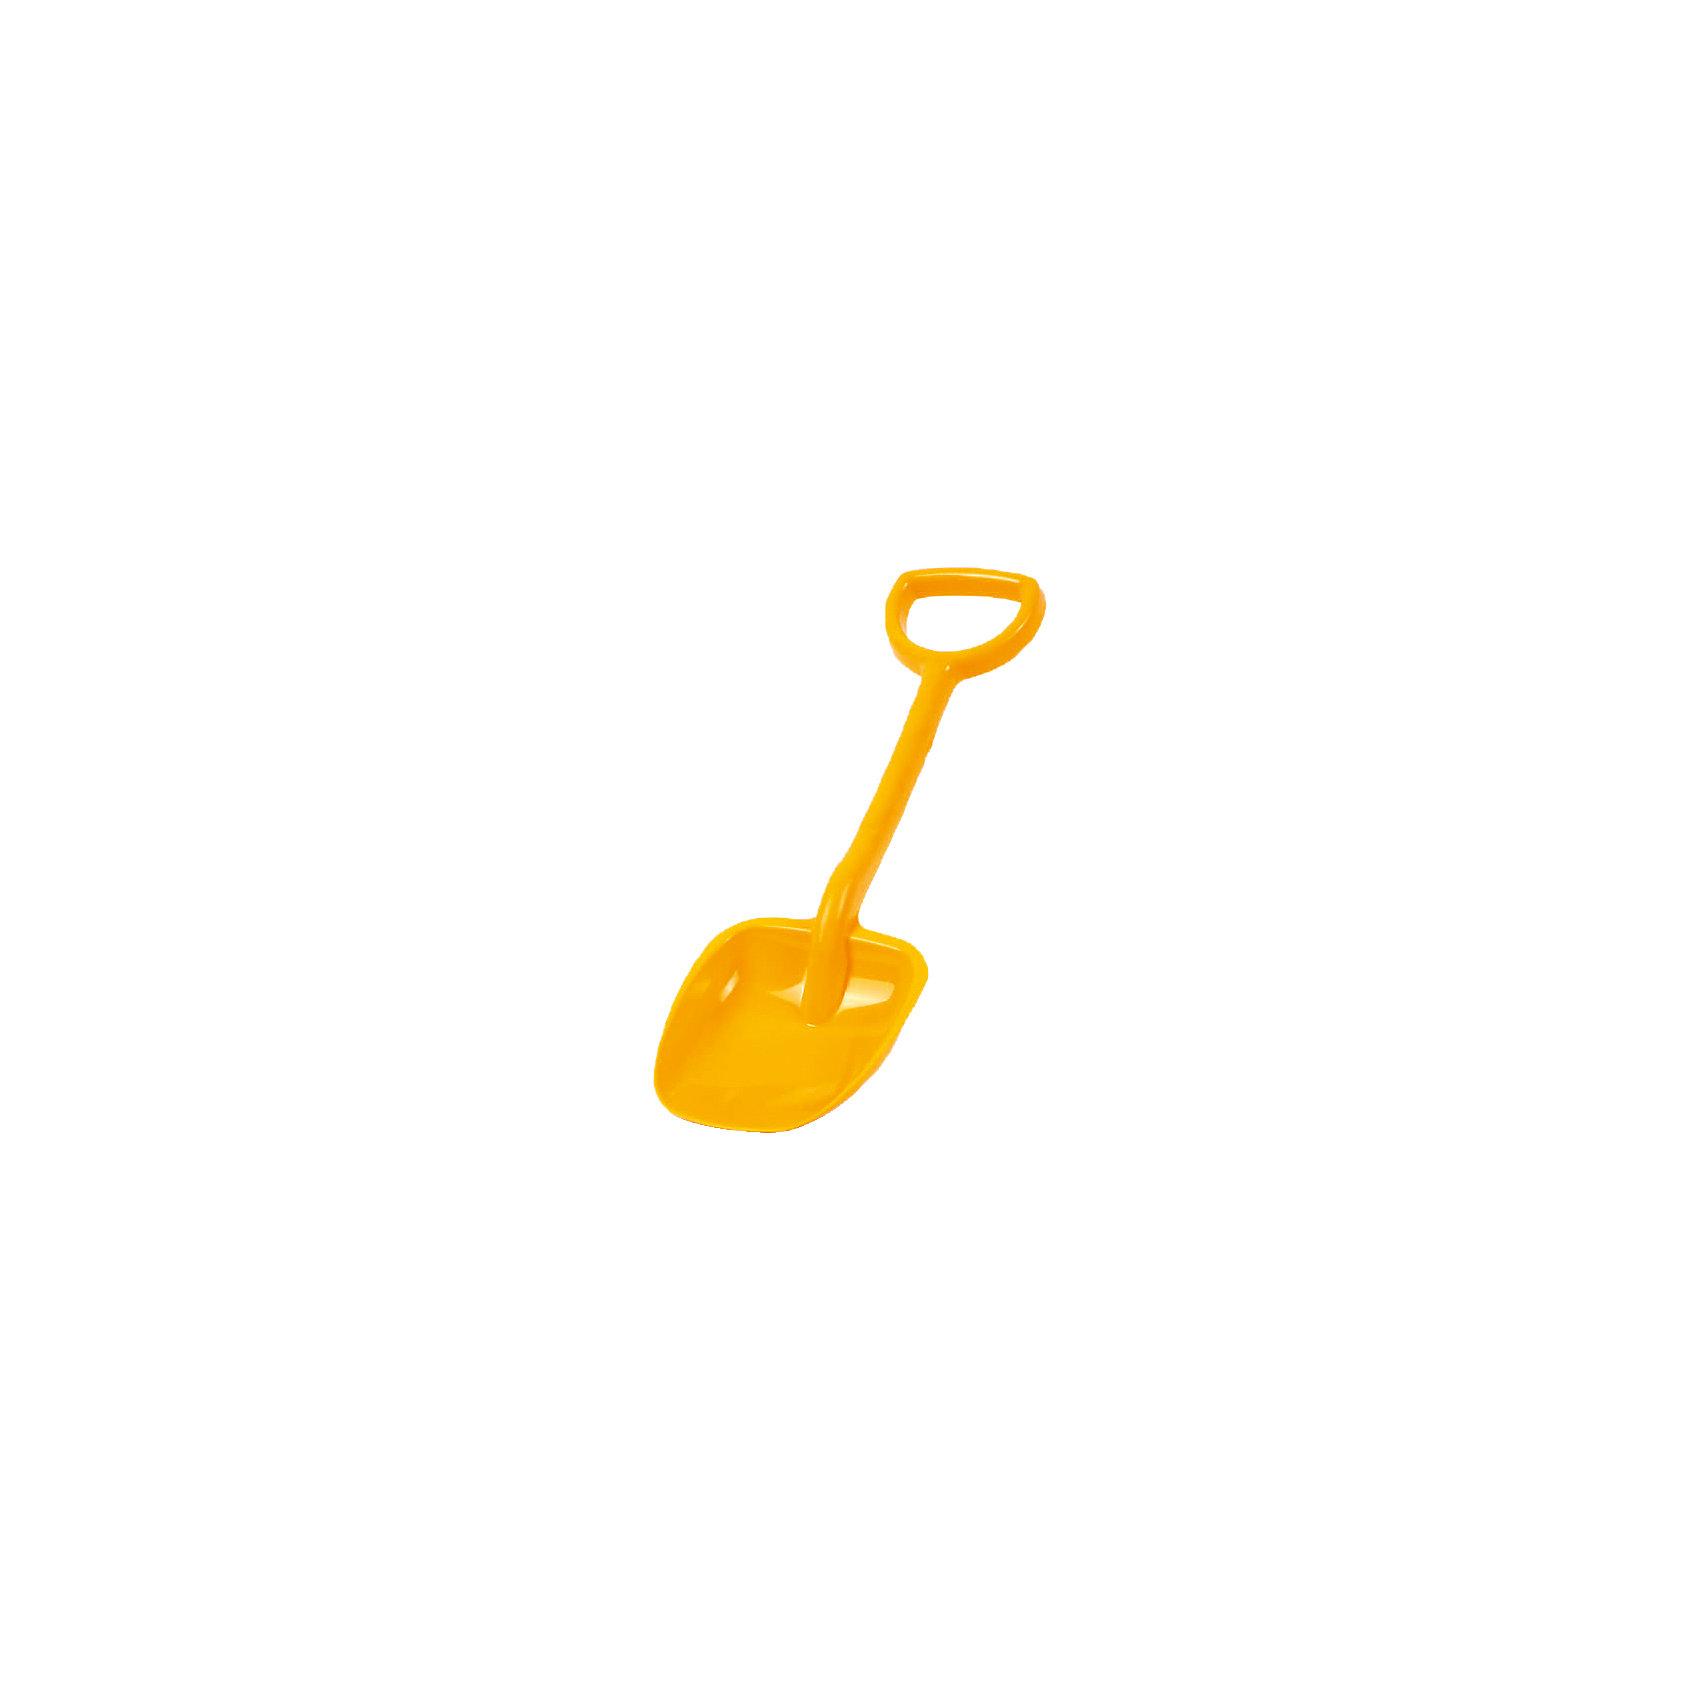 - Детская лопата, желтая, 48 см. лопата truper pcl pe 31174